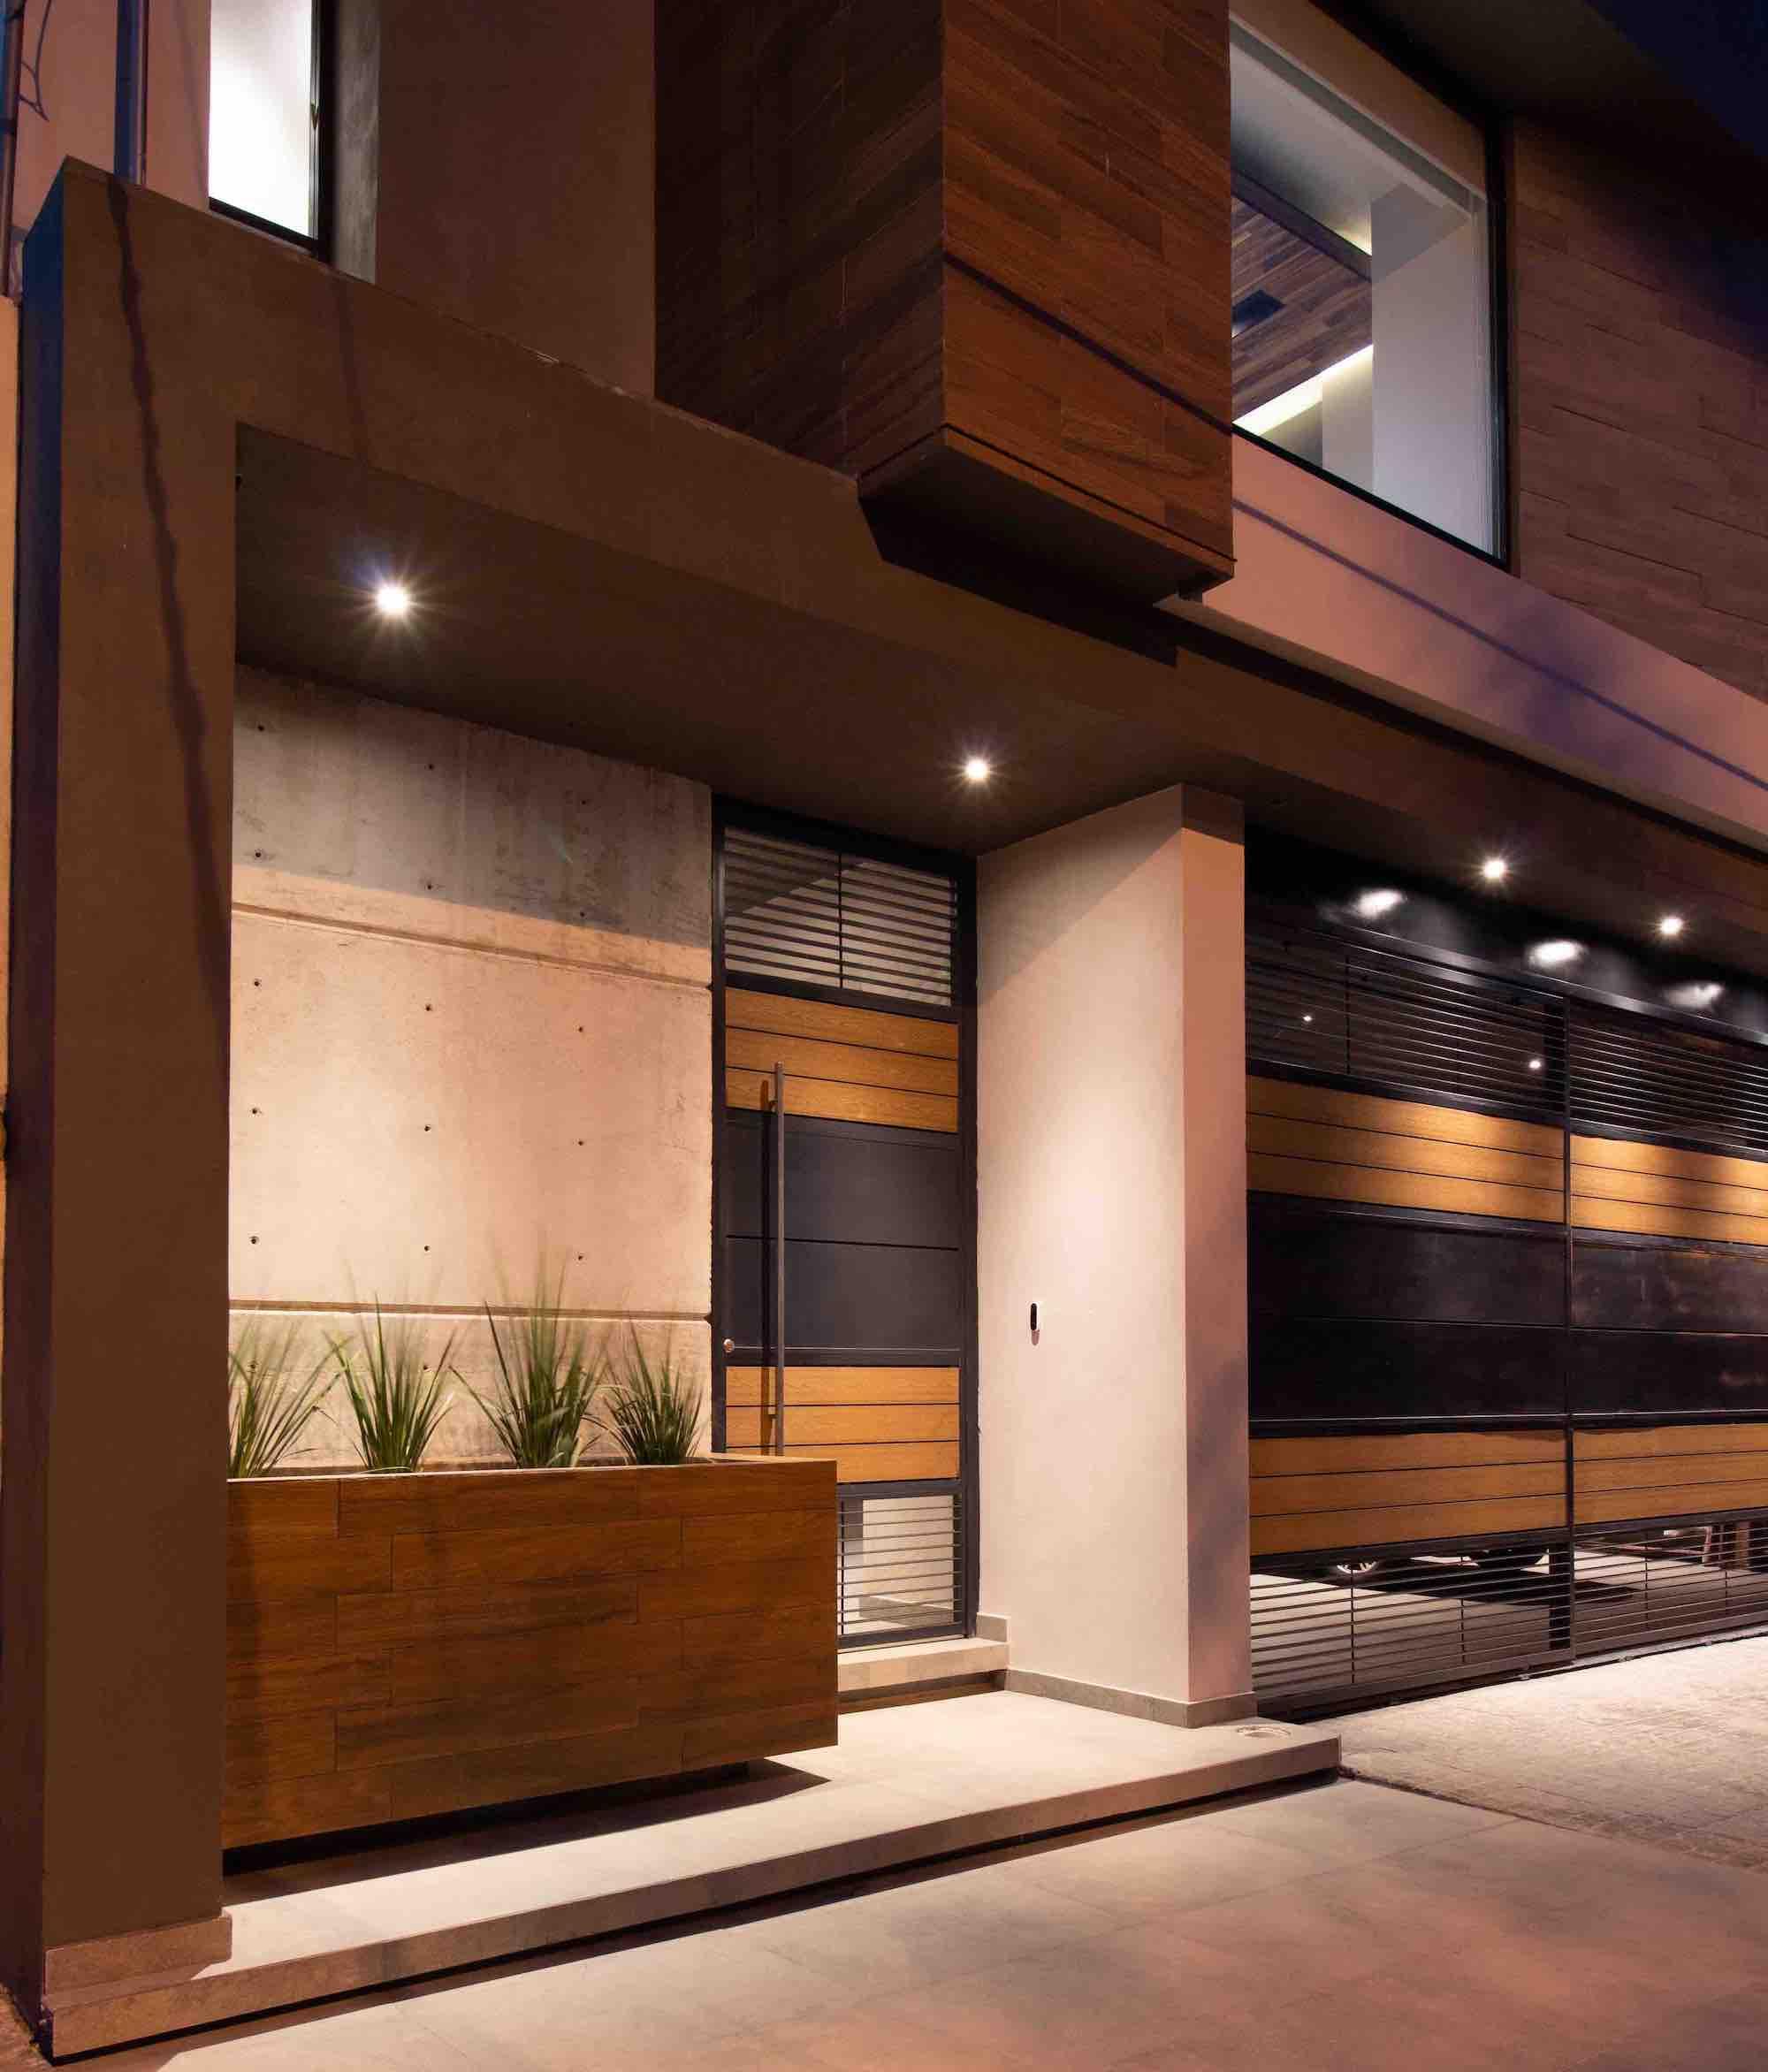 GR_House_Gallardo_arquitectura_amazingarchitecture_mexico_012.jpg